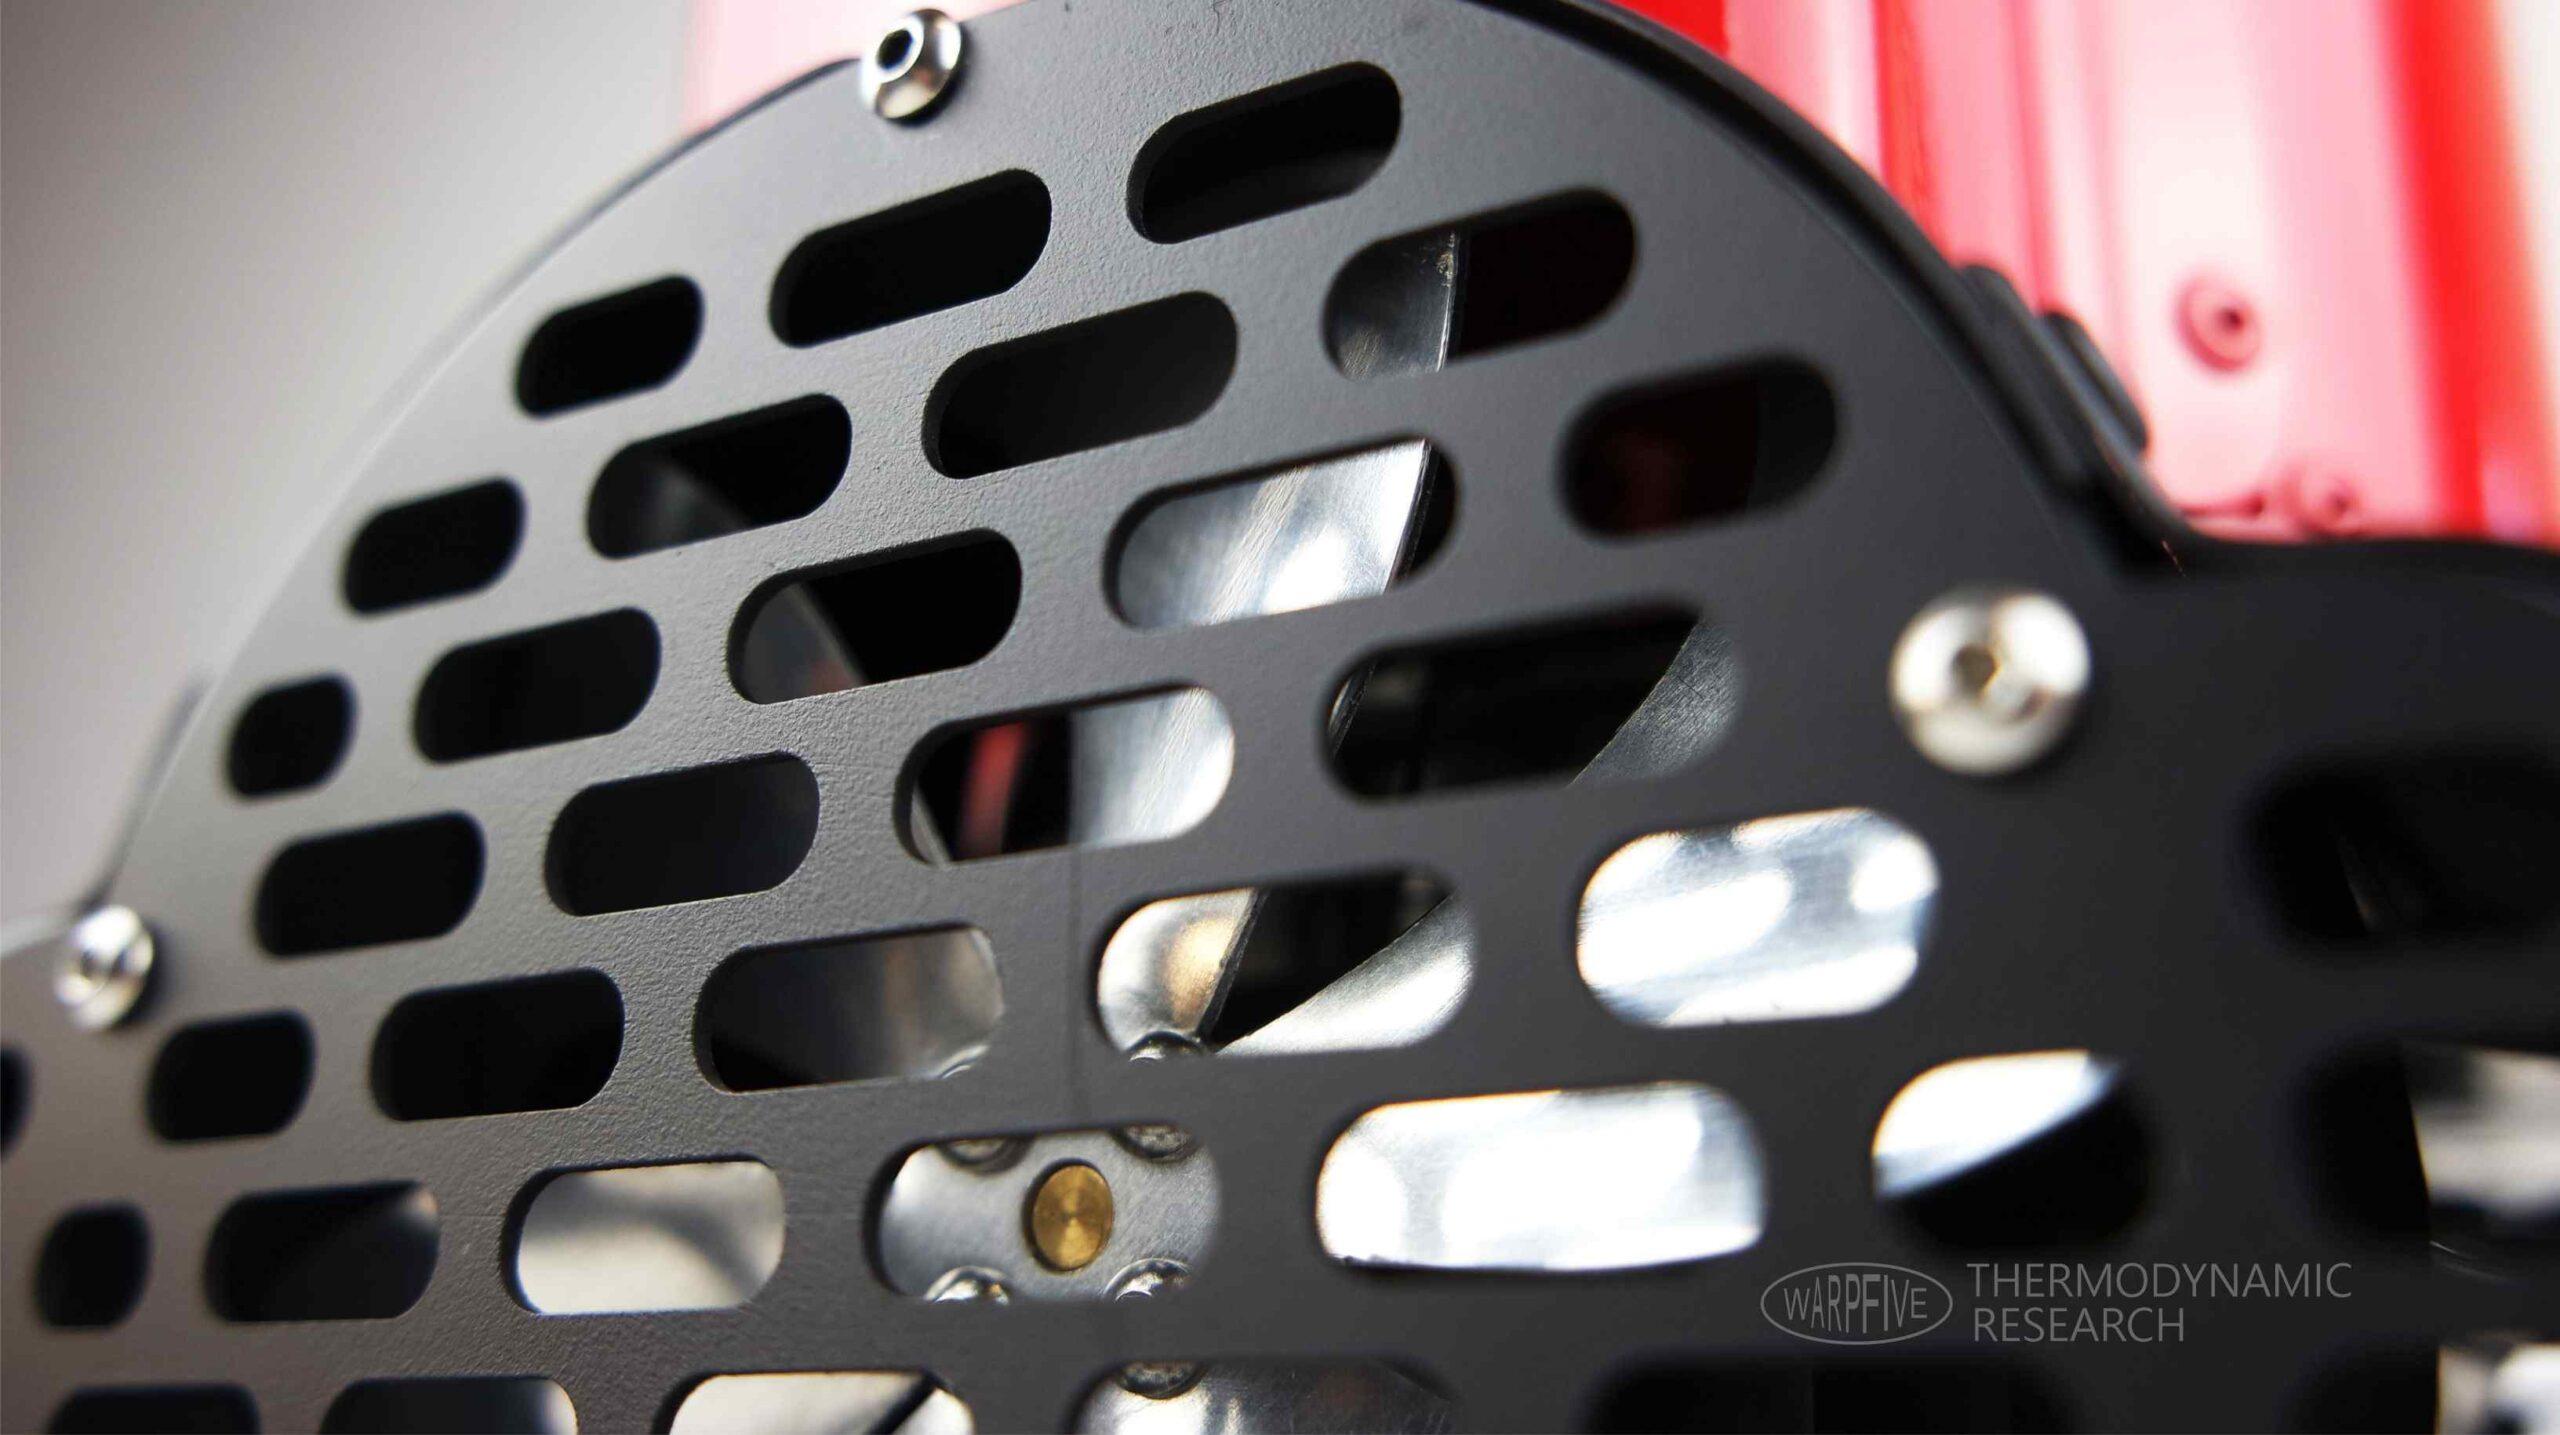 Close up of Warpfive Stirling engine generator cooling fan